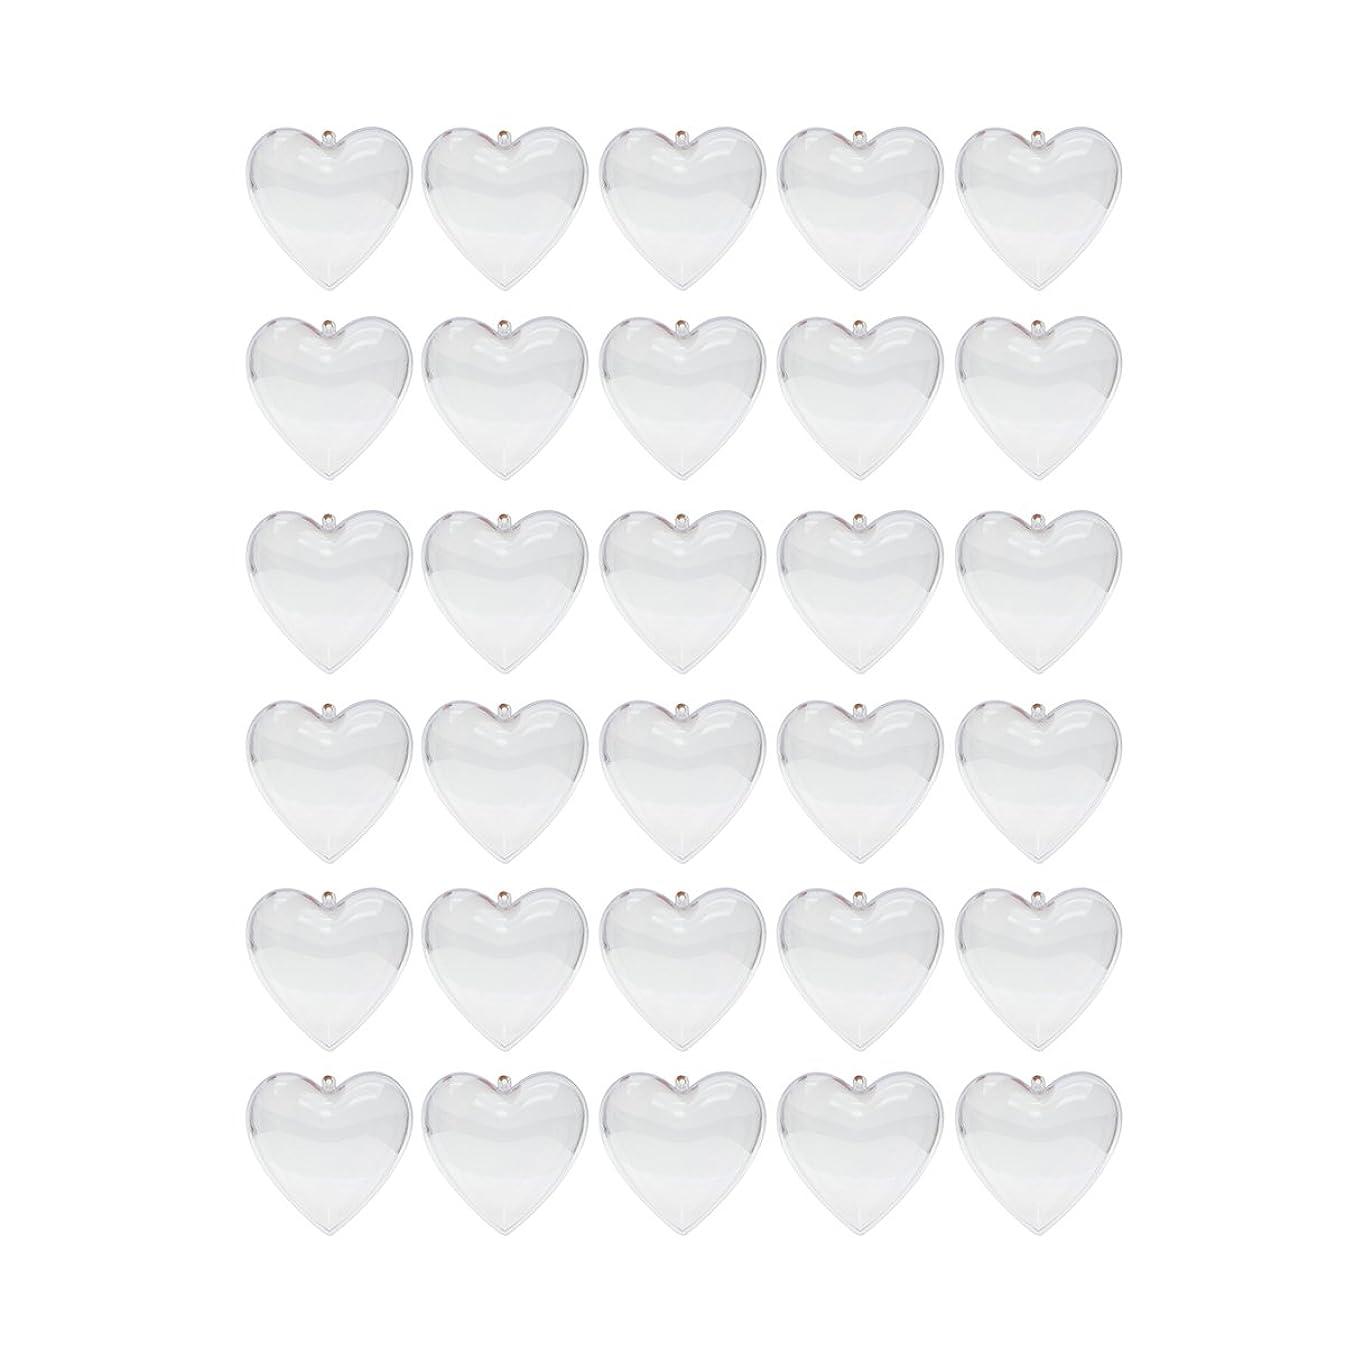 Saim 80mm Clear Plastic Acrylic Heart Shape Fillable Balls Christmas Tree Ornaments DIY Bath Bomb Molds Pack of 30